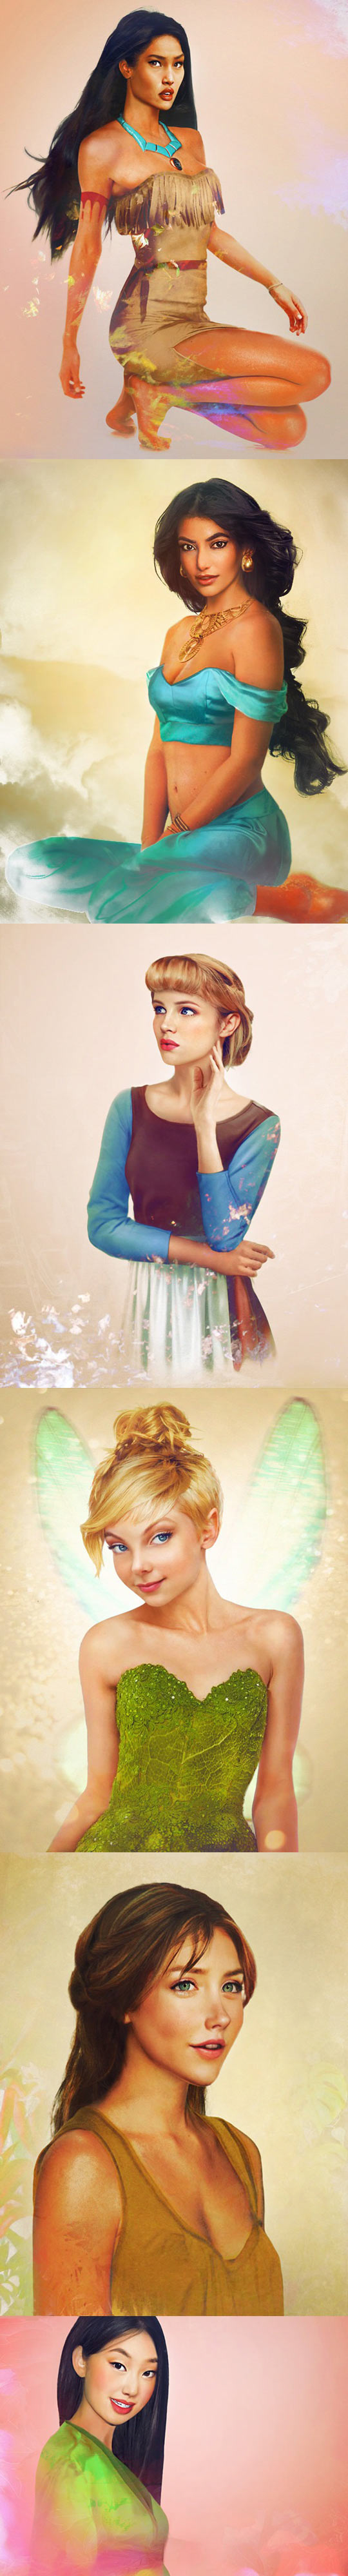 cool-real-life-Disney-princess-Mulan